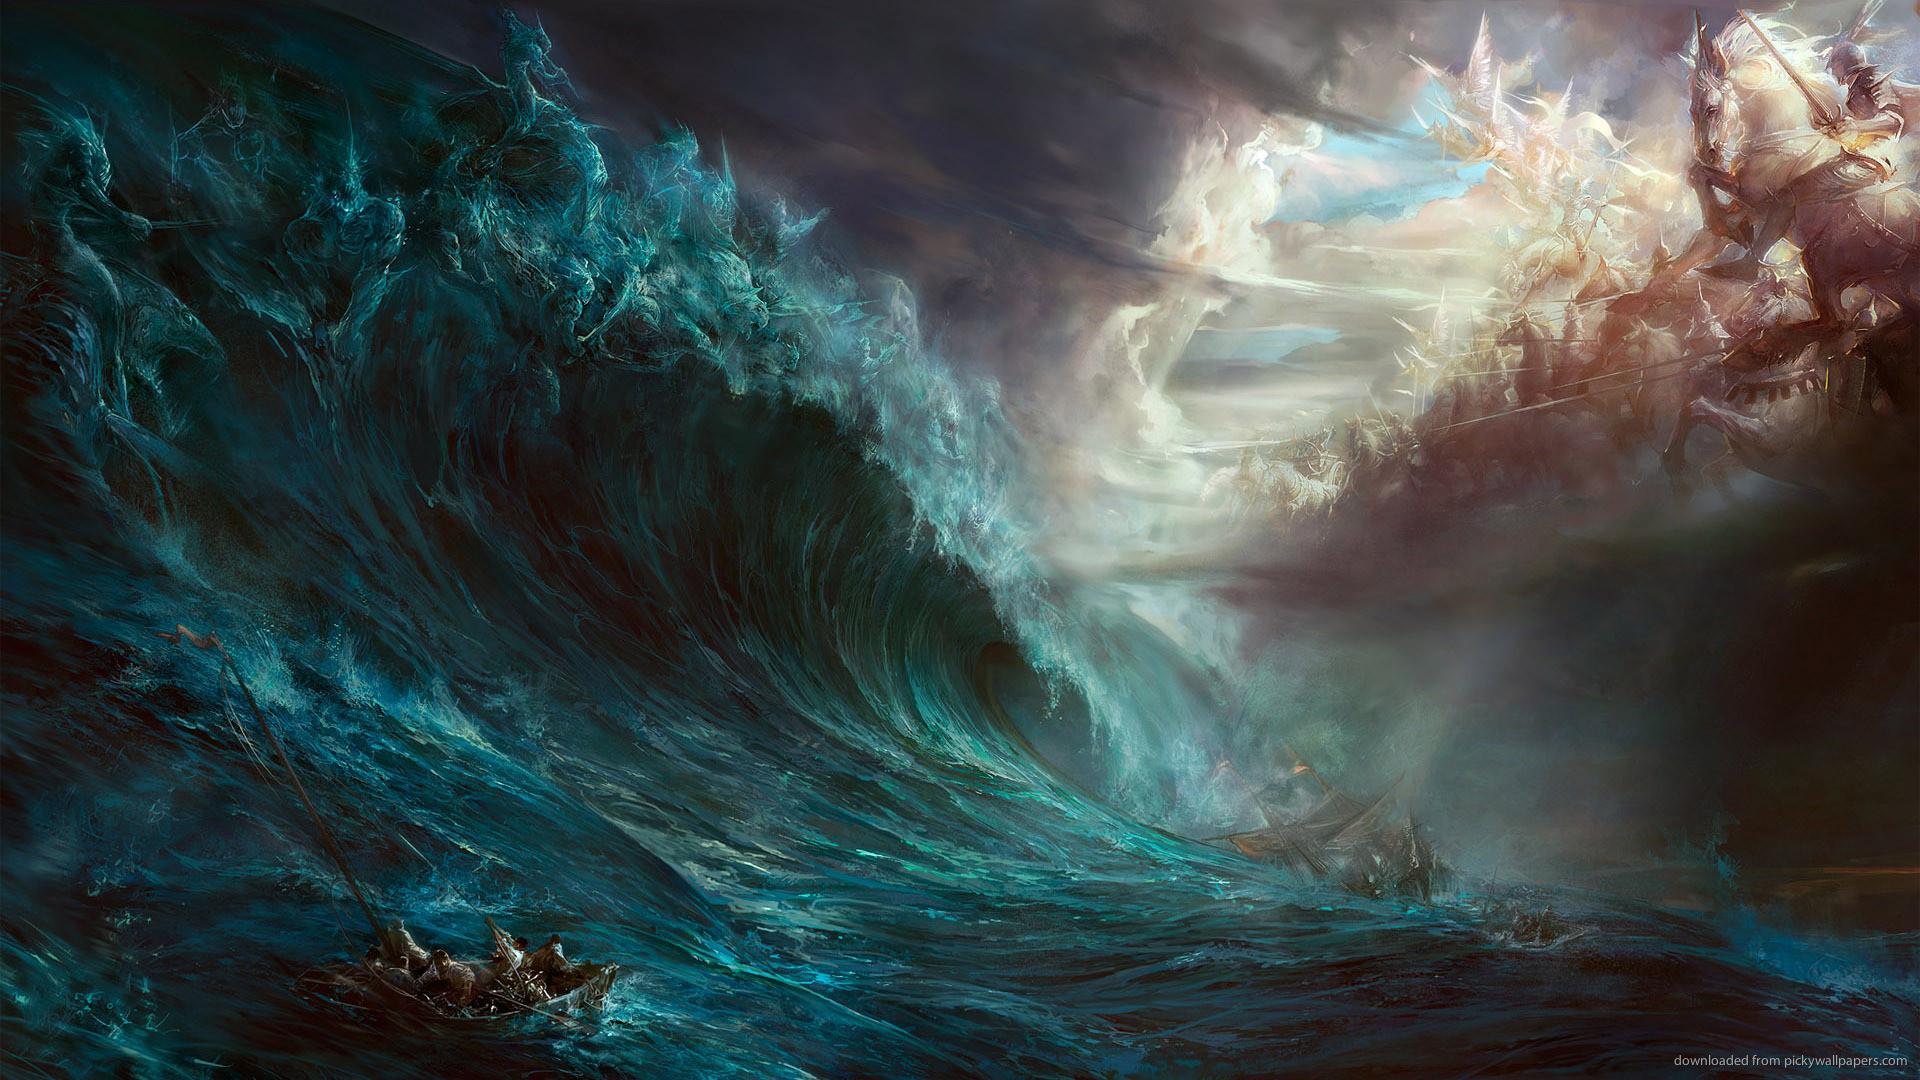 Epic Storm picture